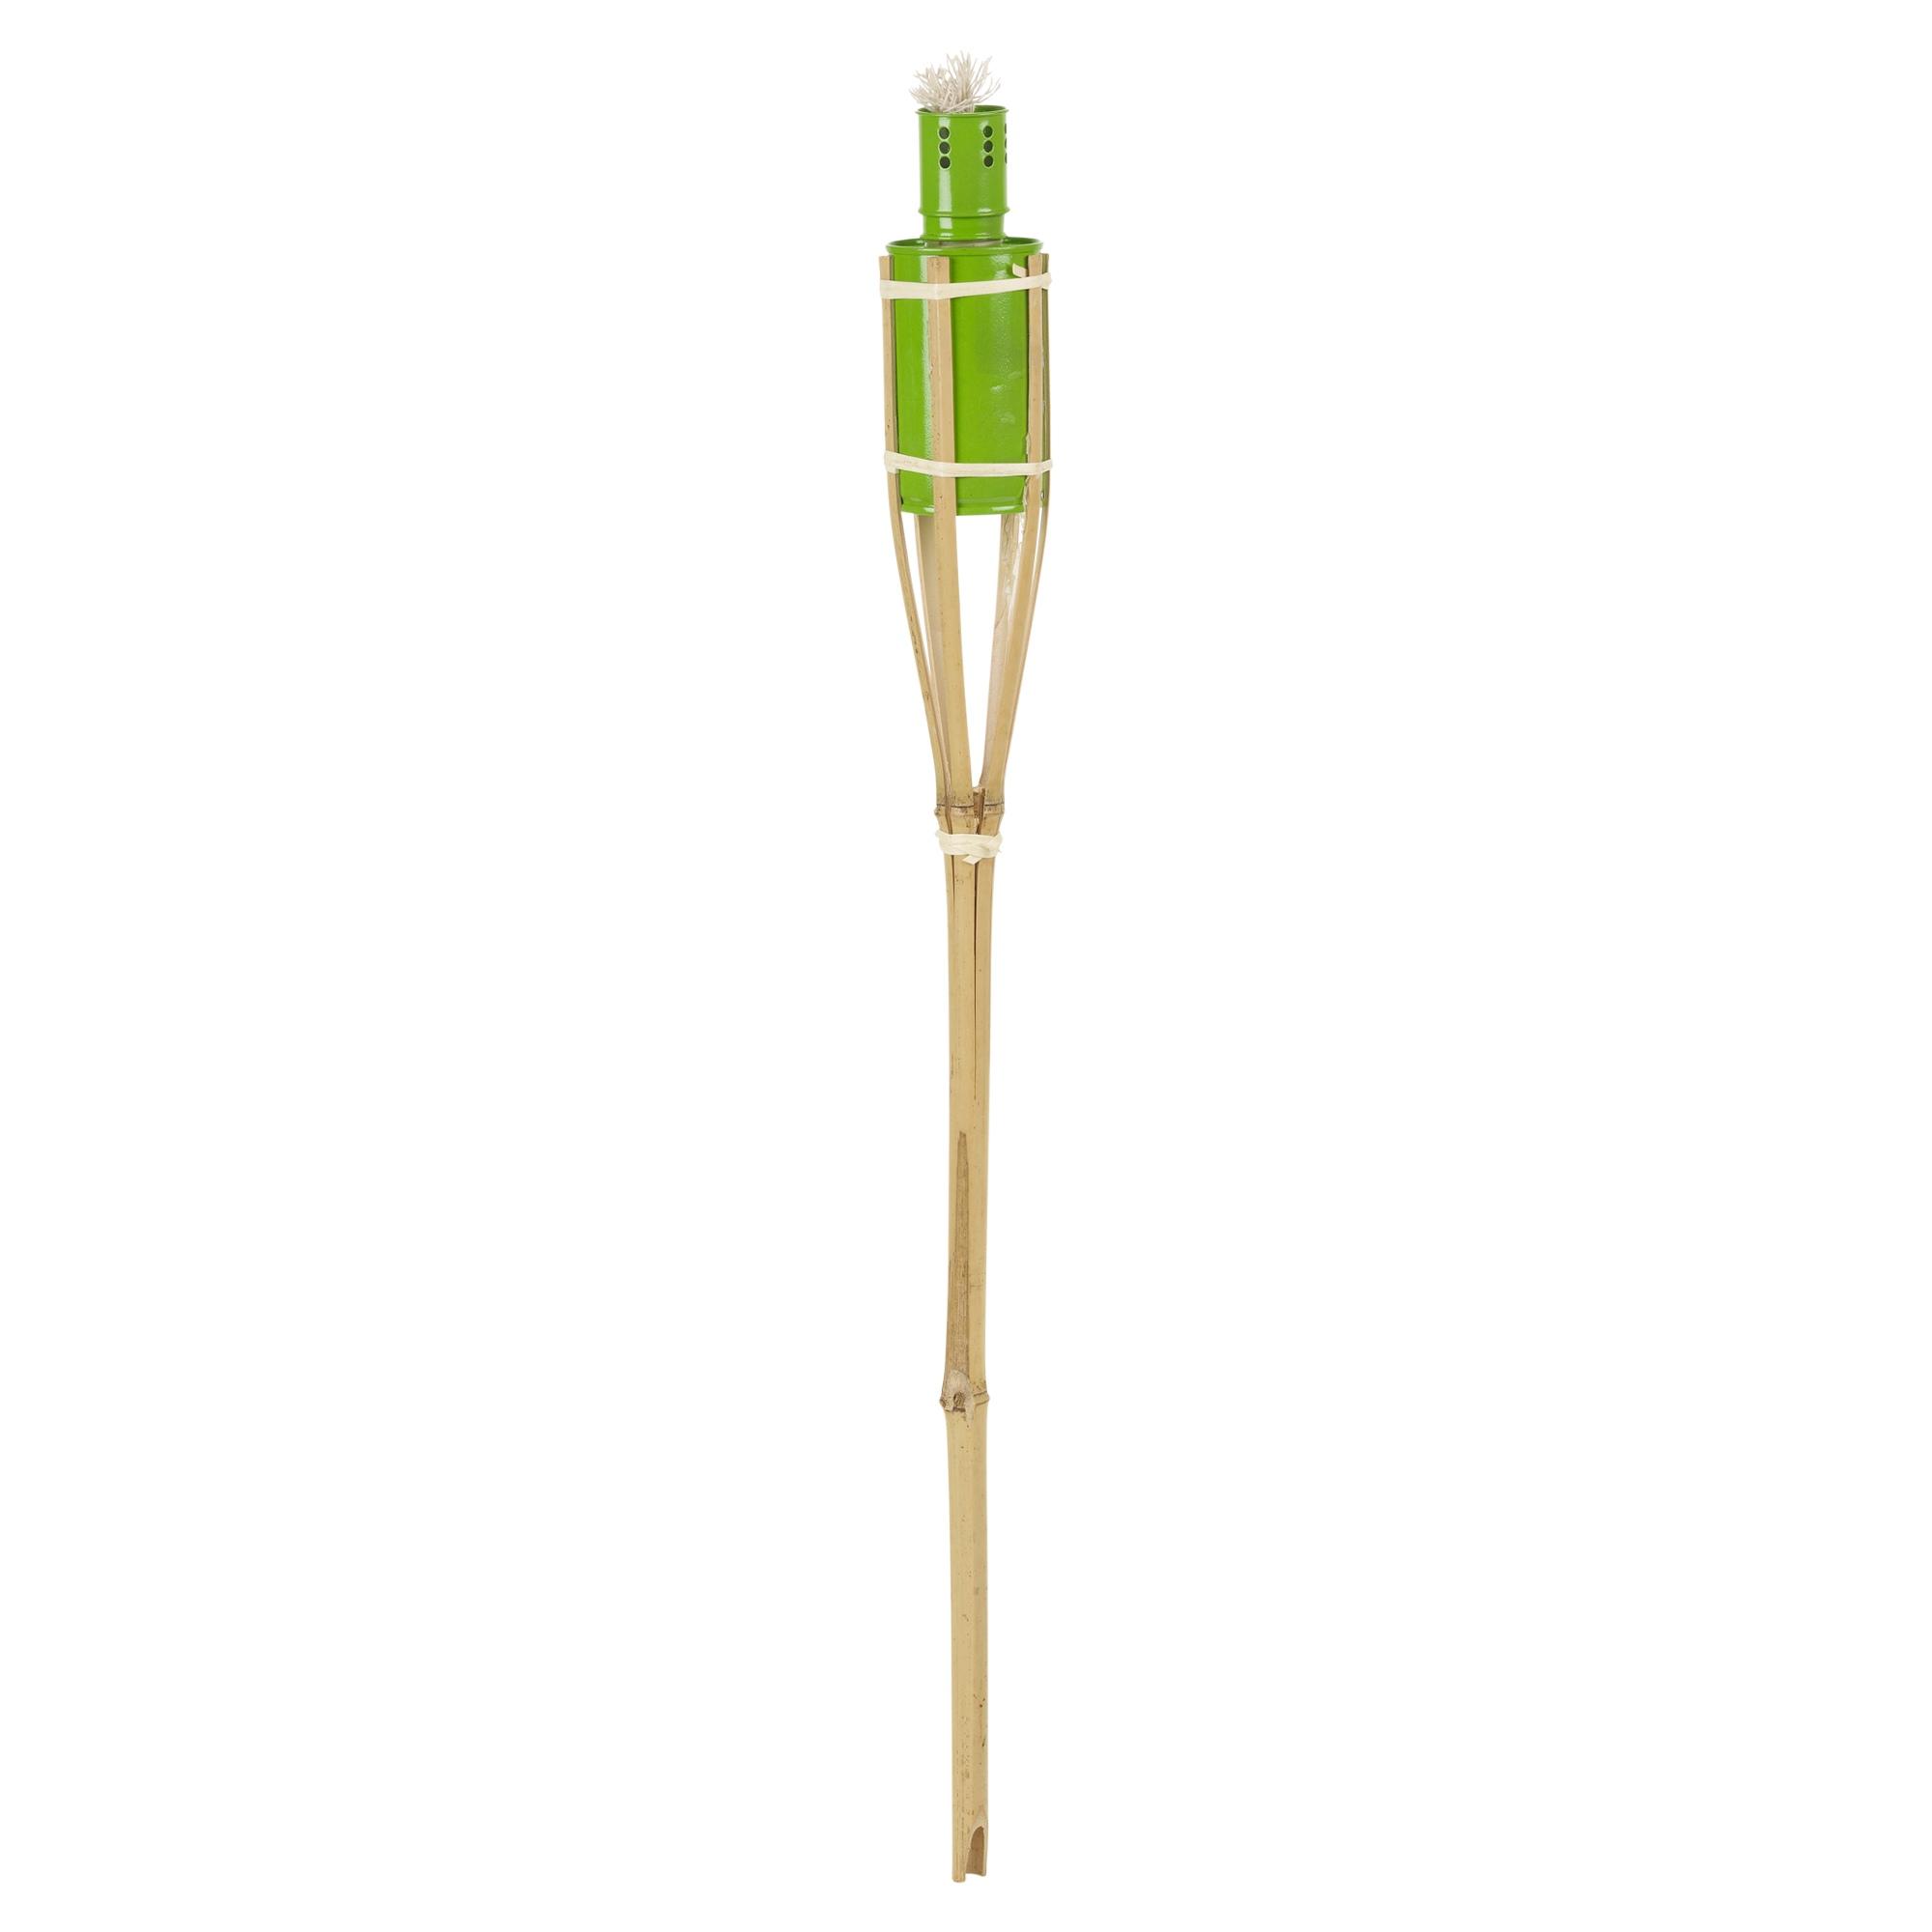 6x 2ft bamboo torch lantern garden oil paraffin outdoor